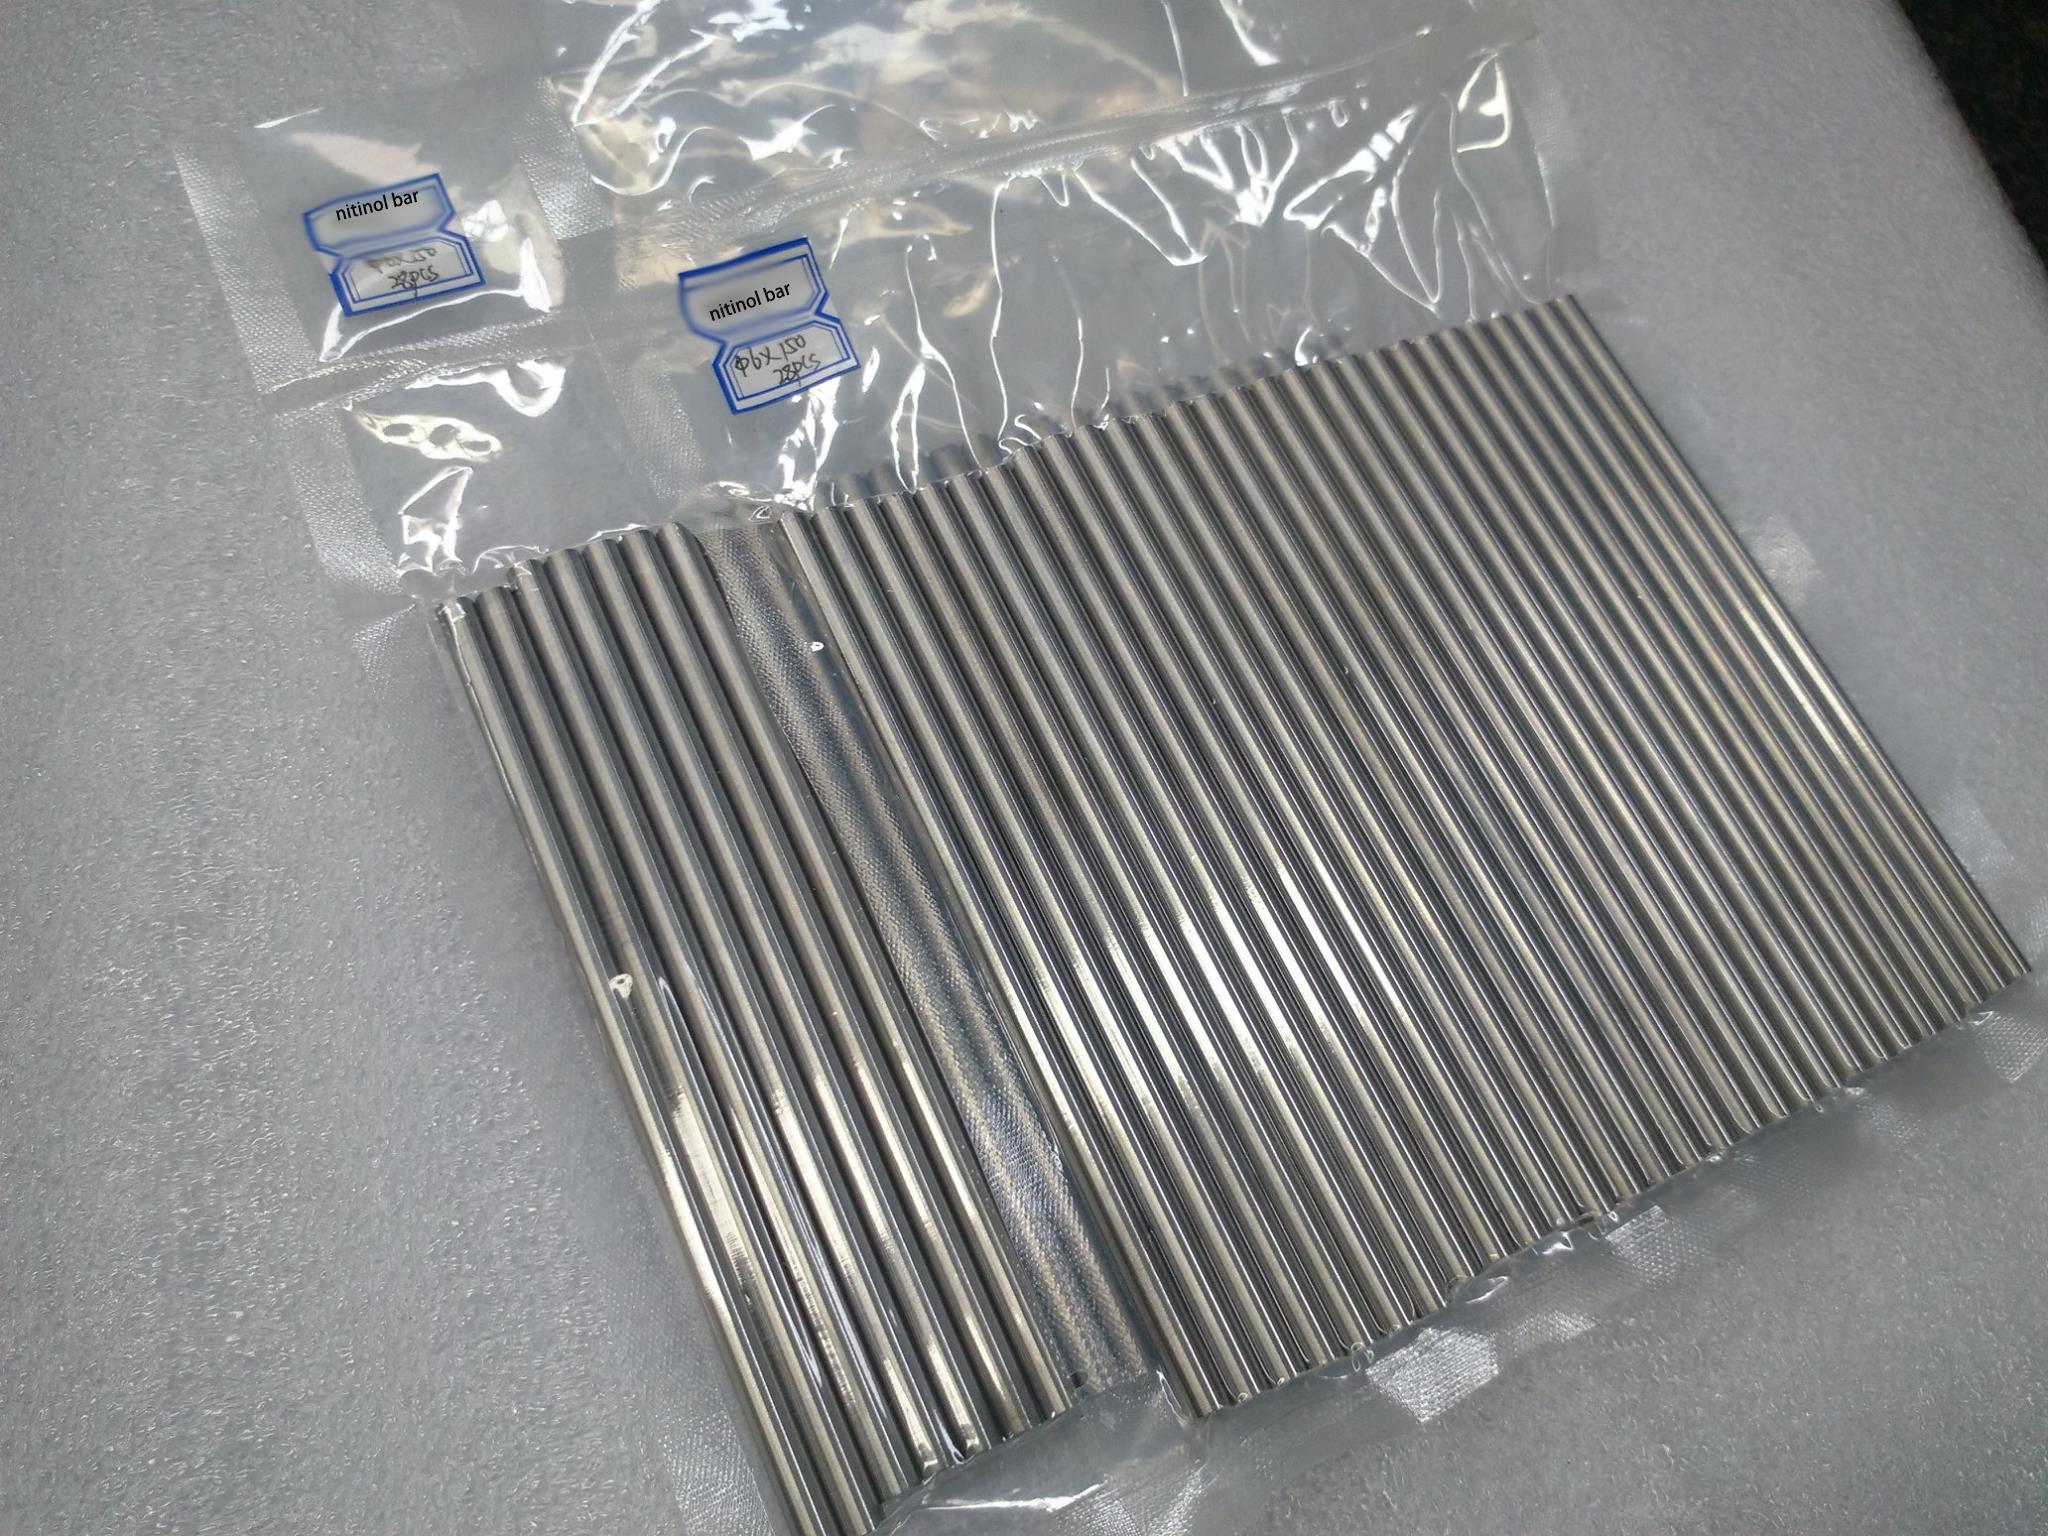 Nitinol alloy bar - Titanium,Nickel,Zr,Non-ferrous metal